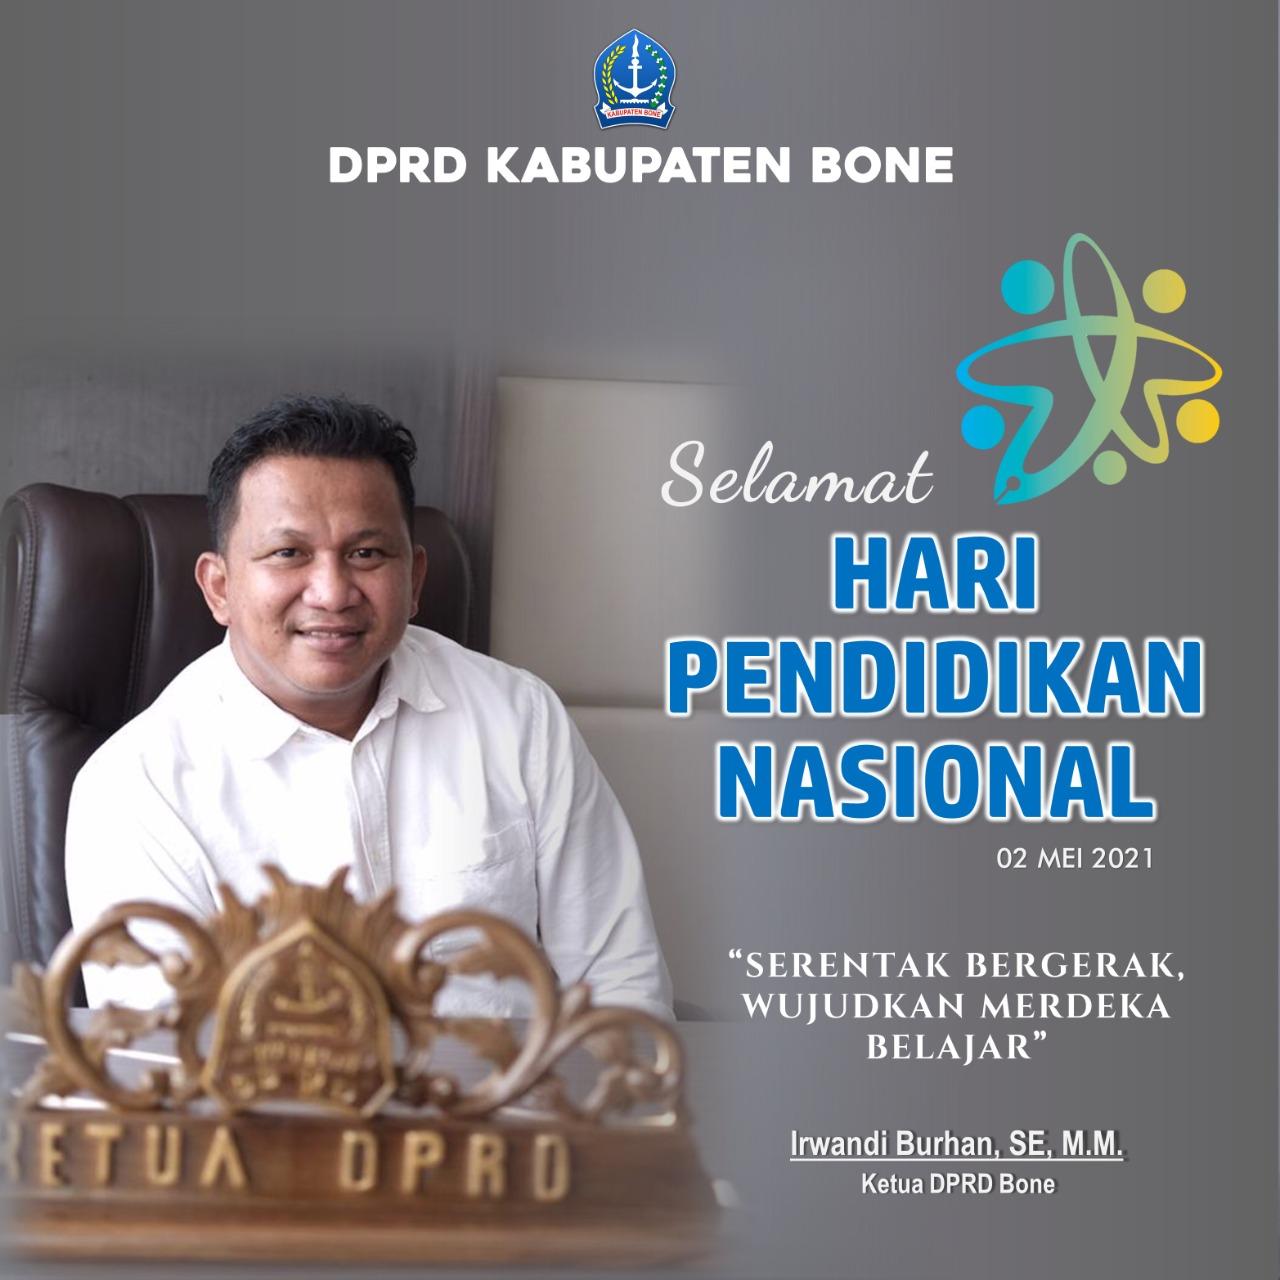 HPN DPRD